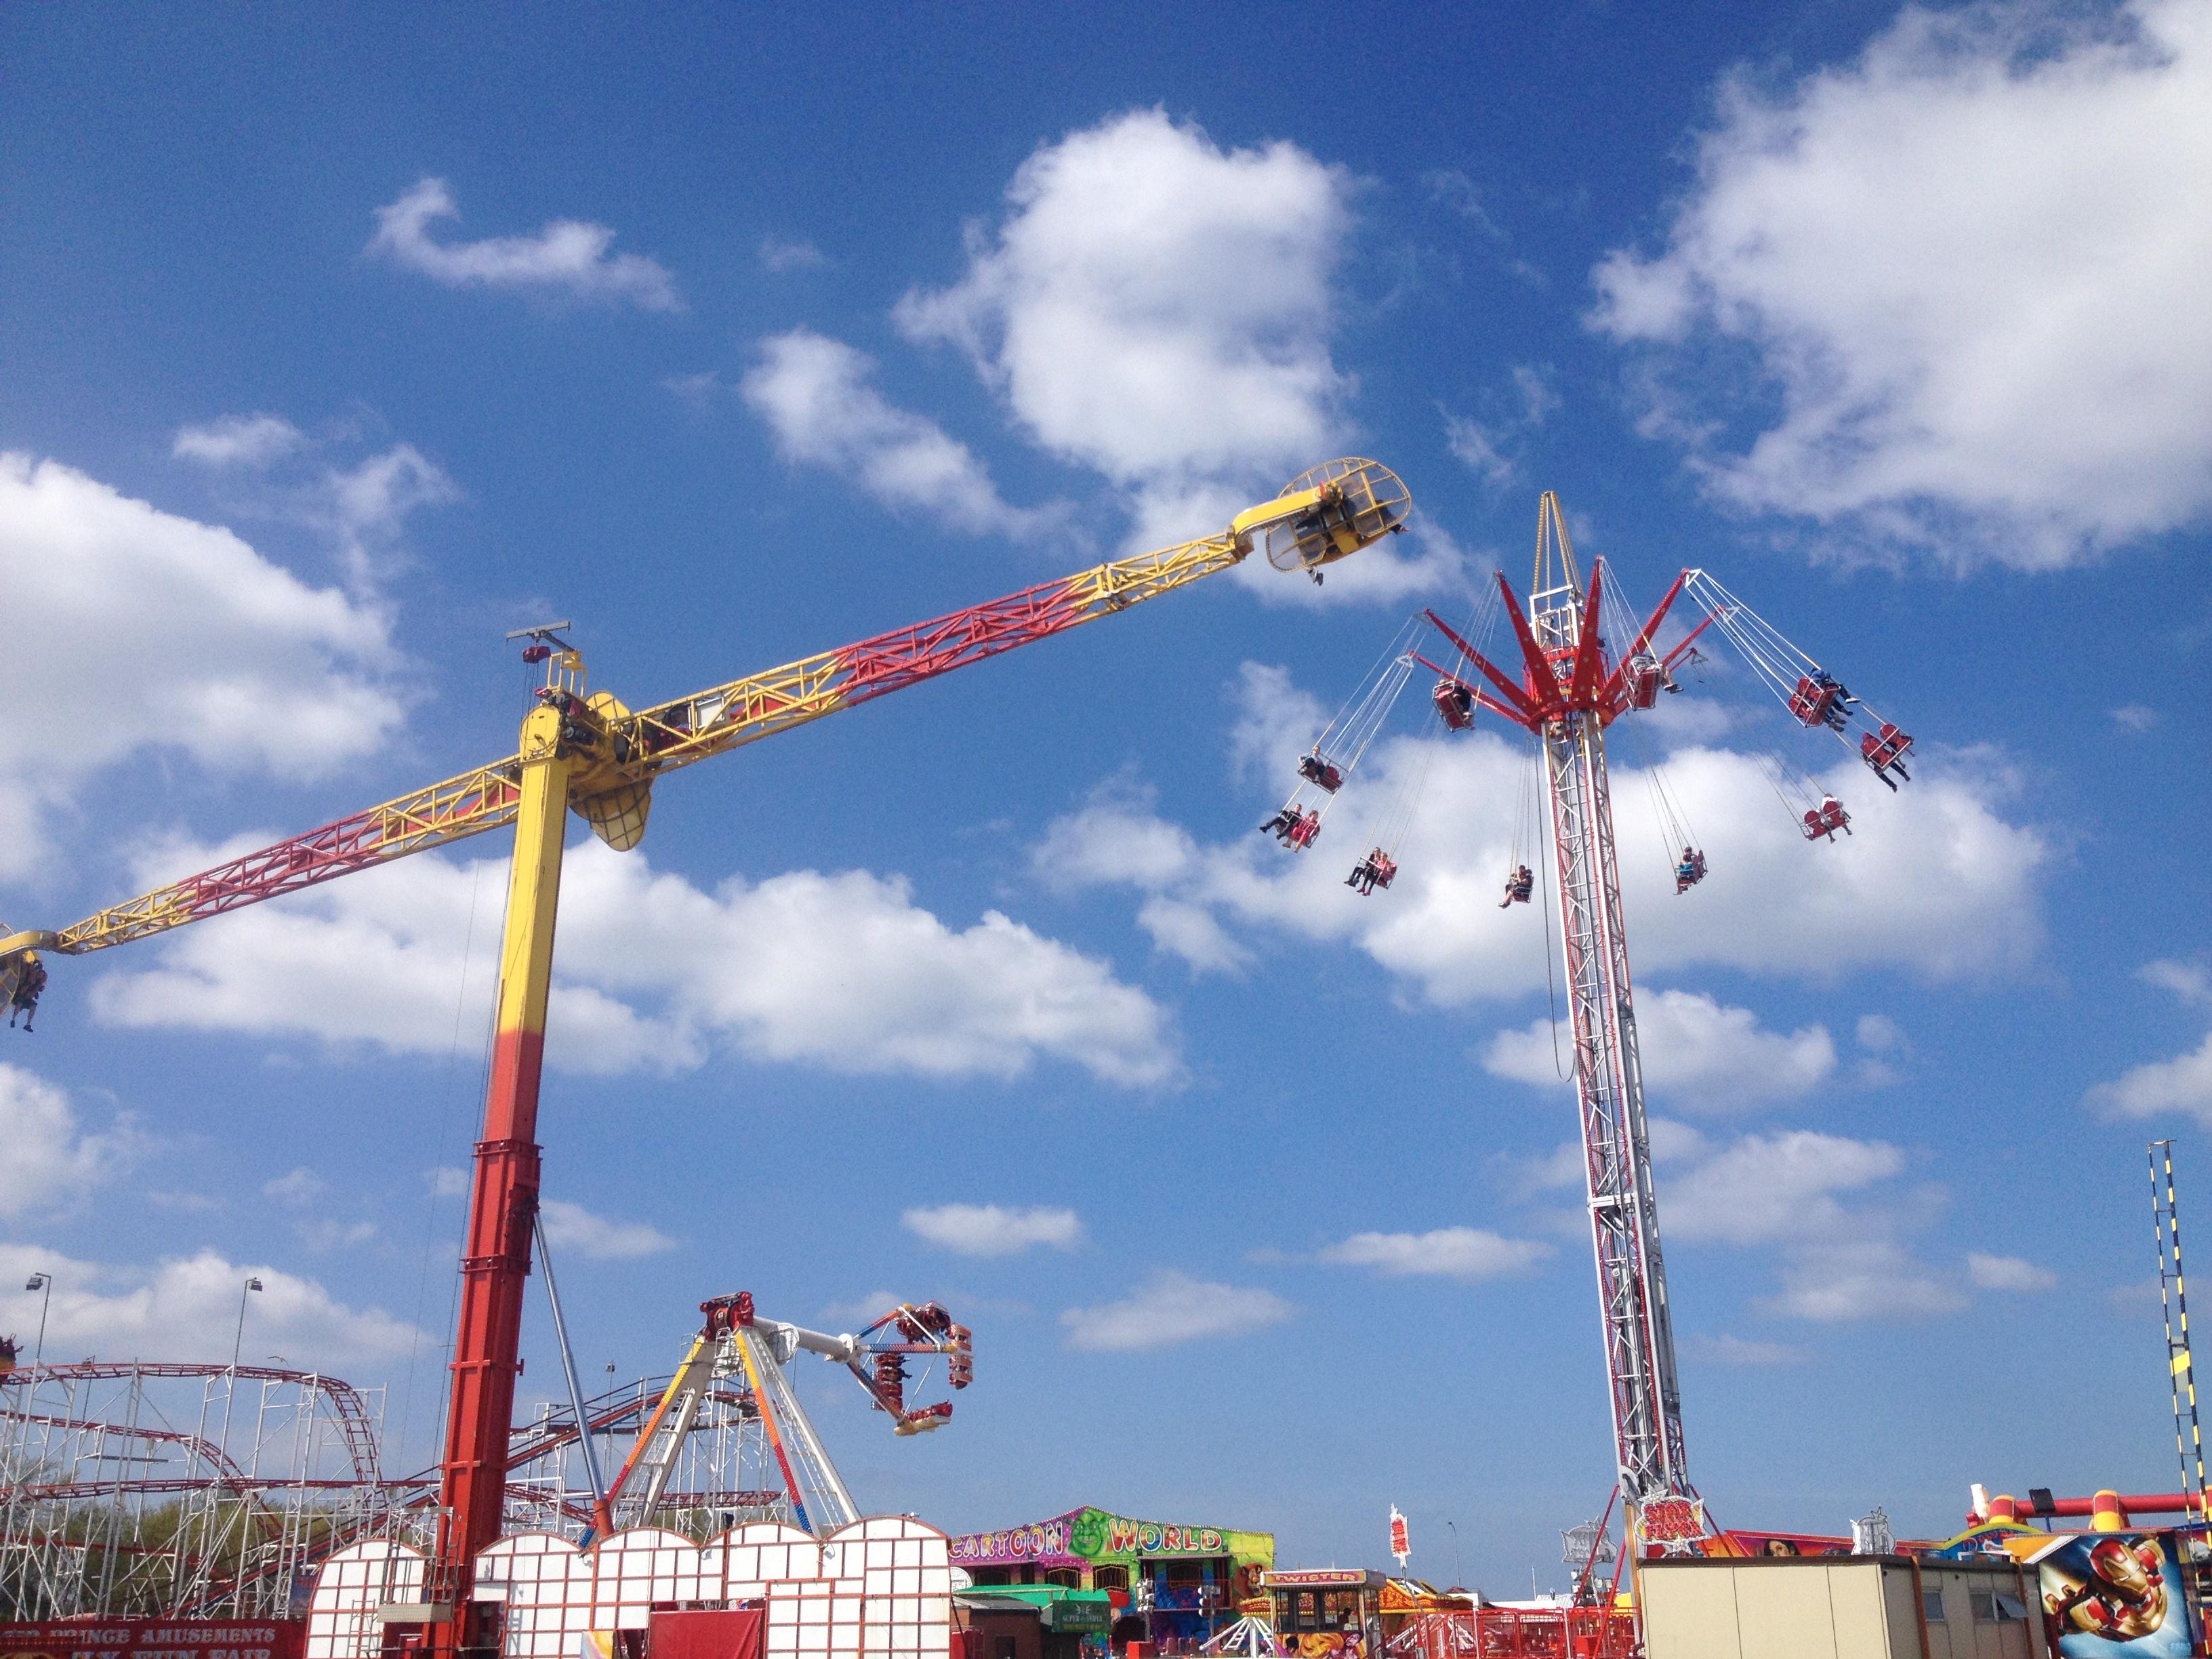 Img 2131 1 Tir Prince Amusement Park